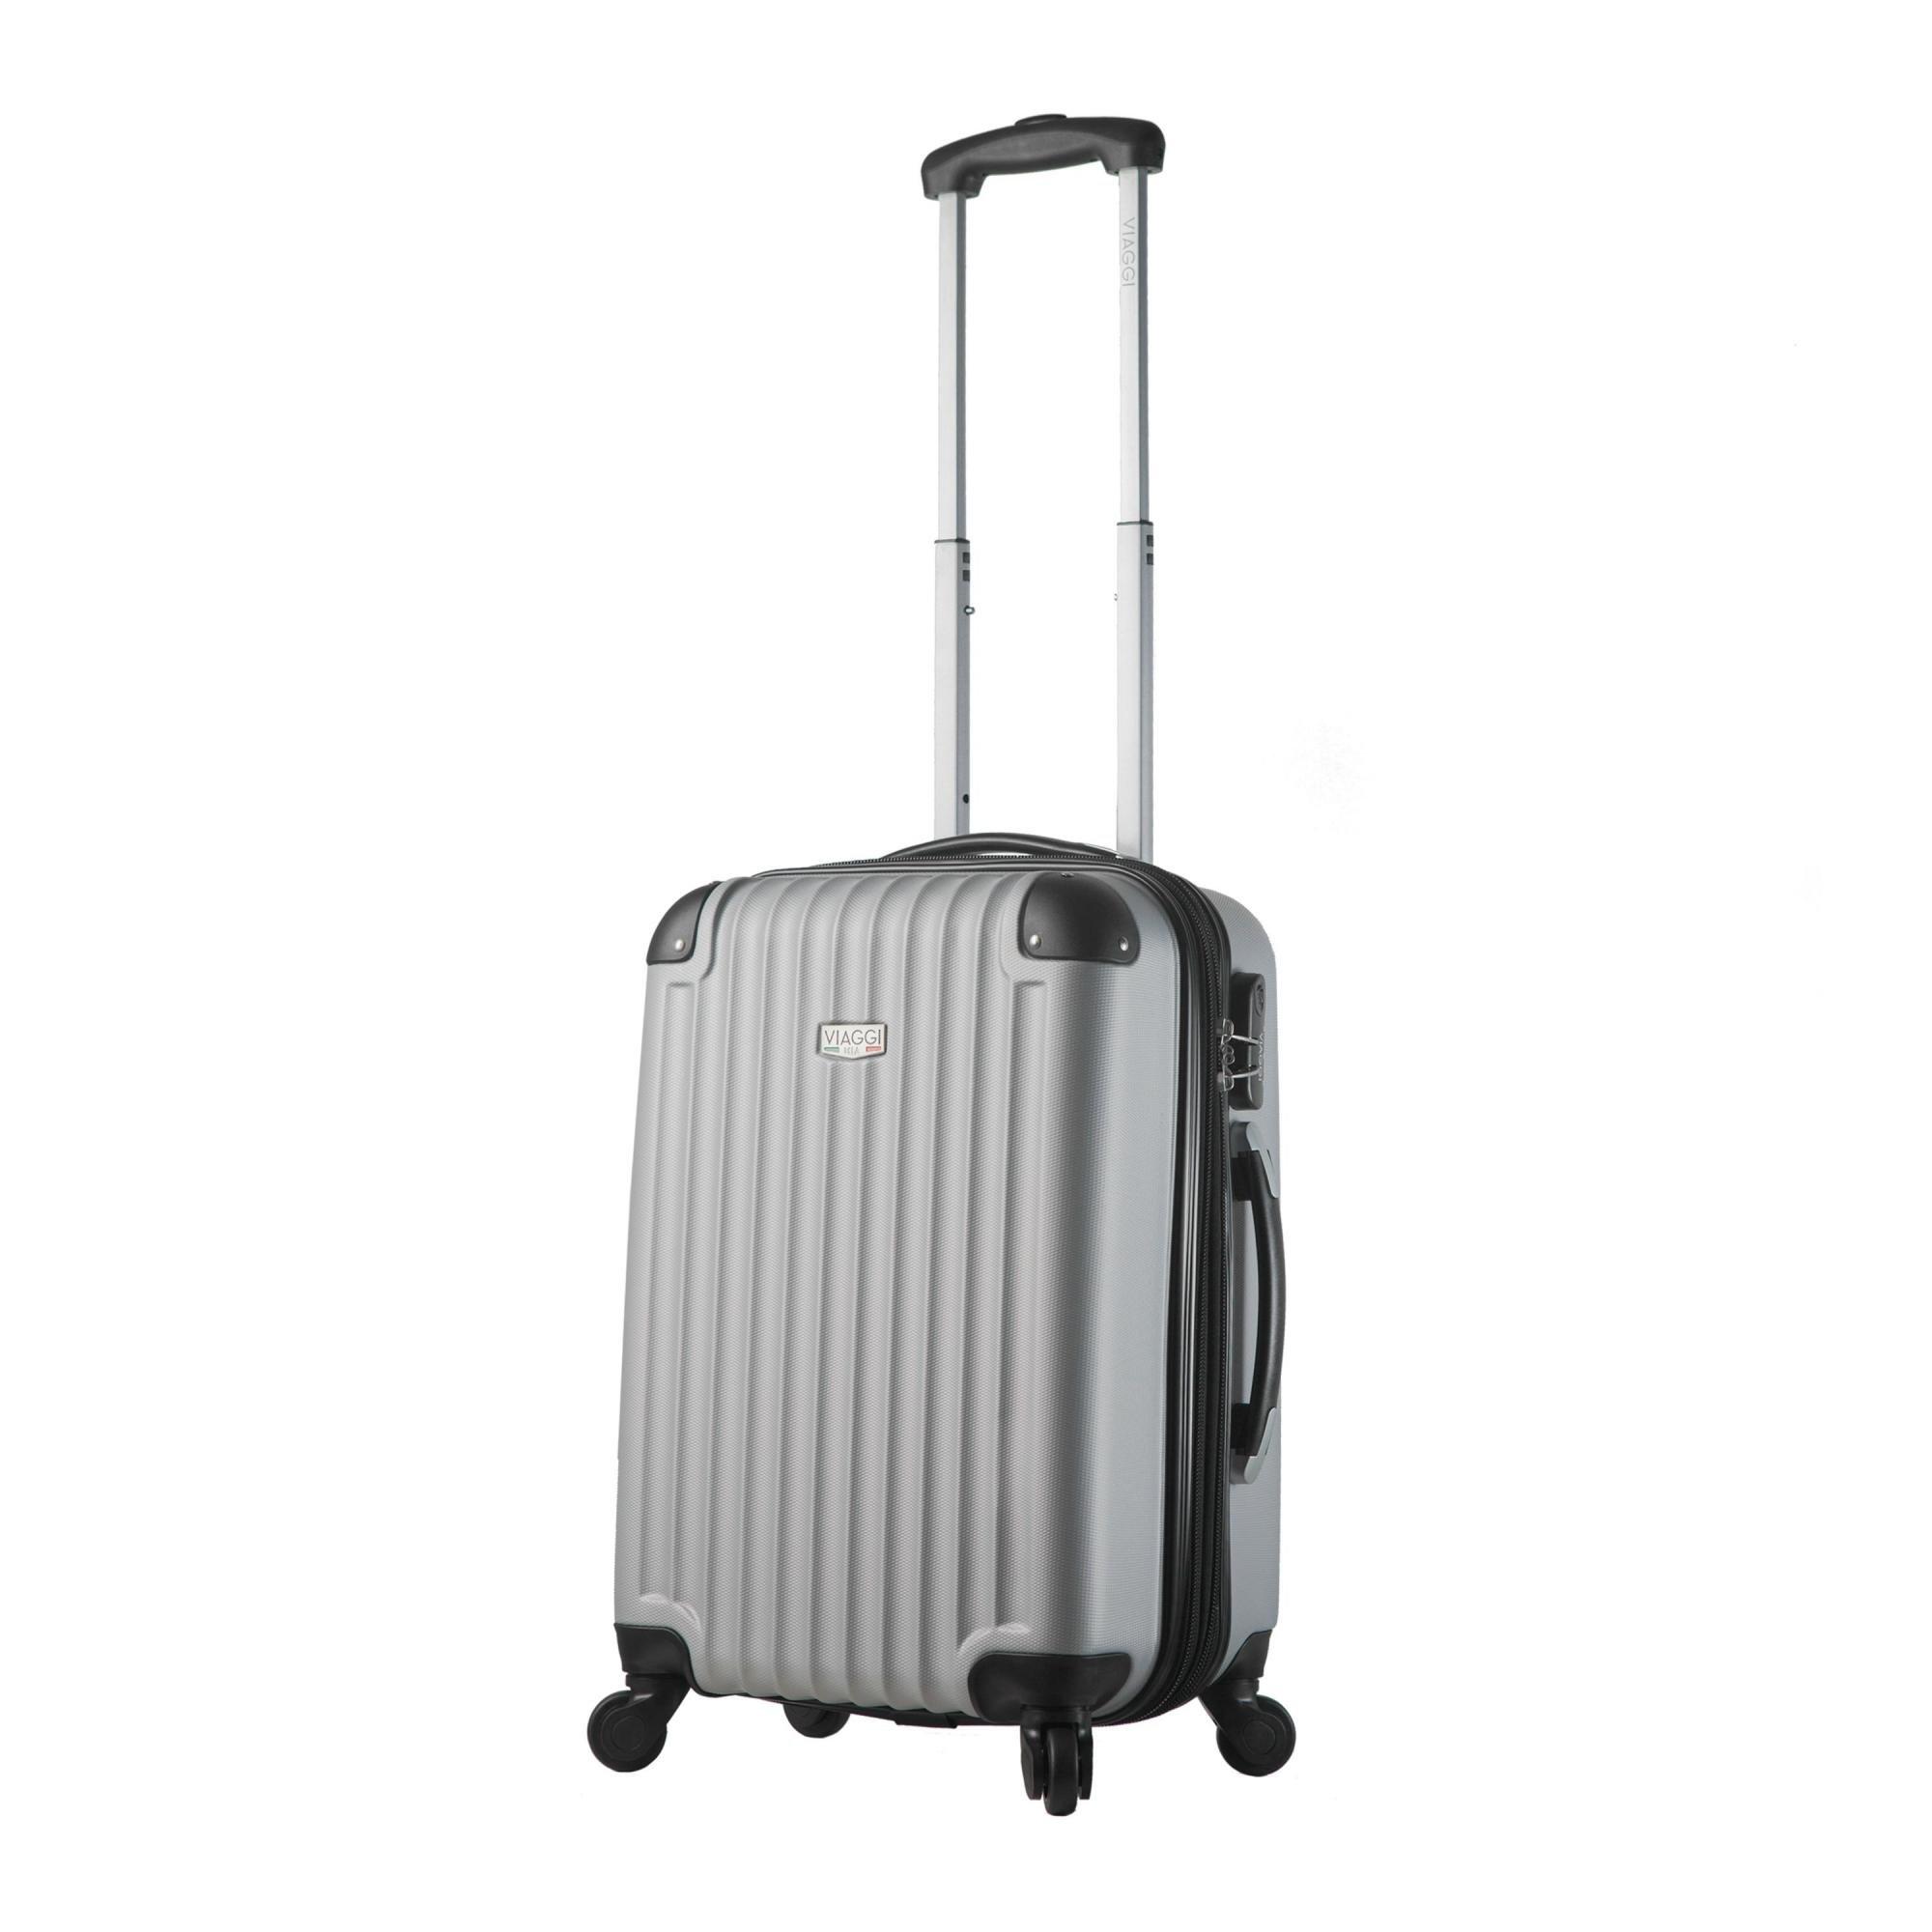 Viaggi Mia Italy Rovigo Hardside Spinner Large Carry-on - Silver